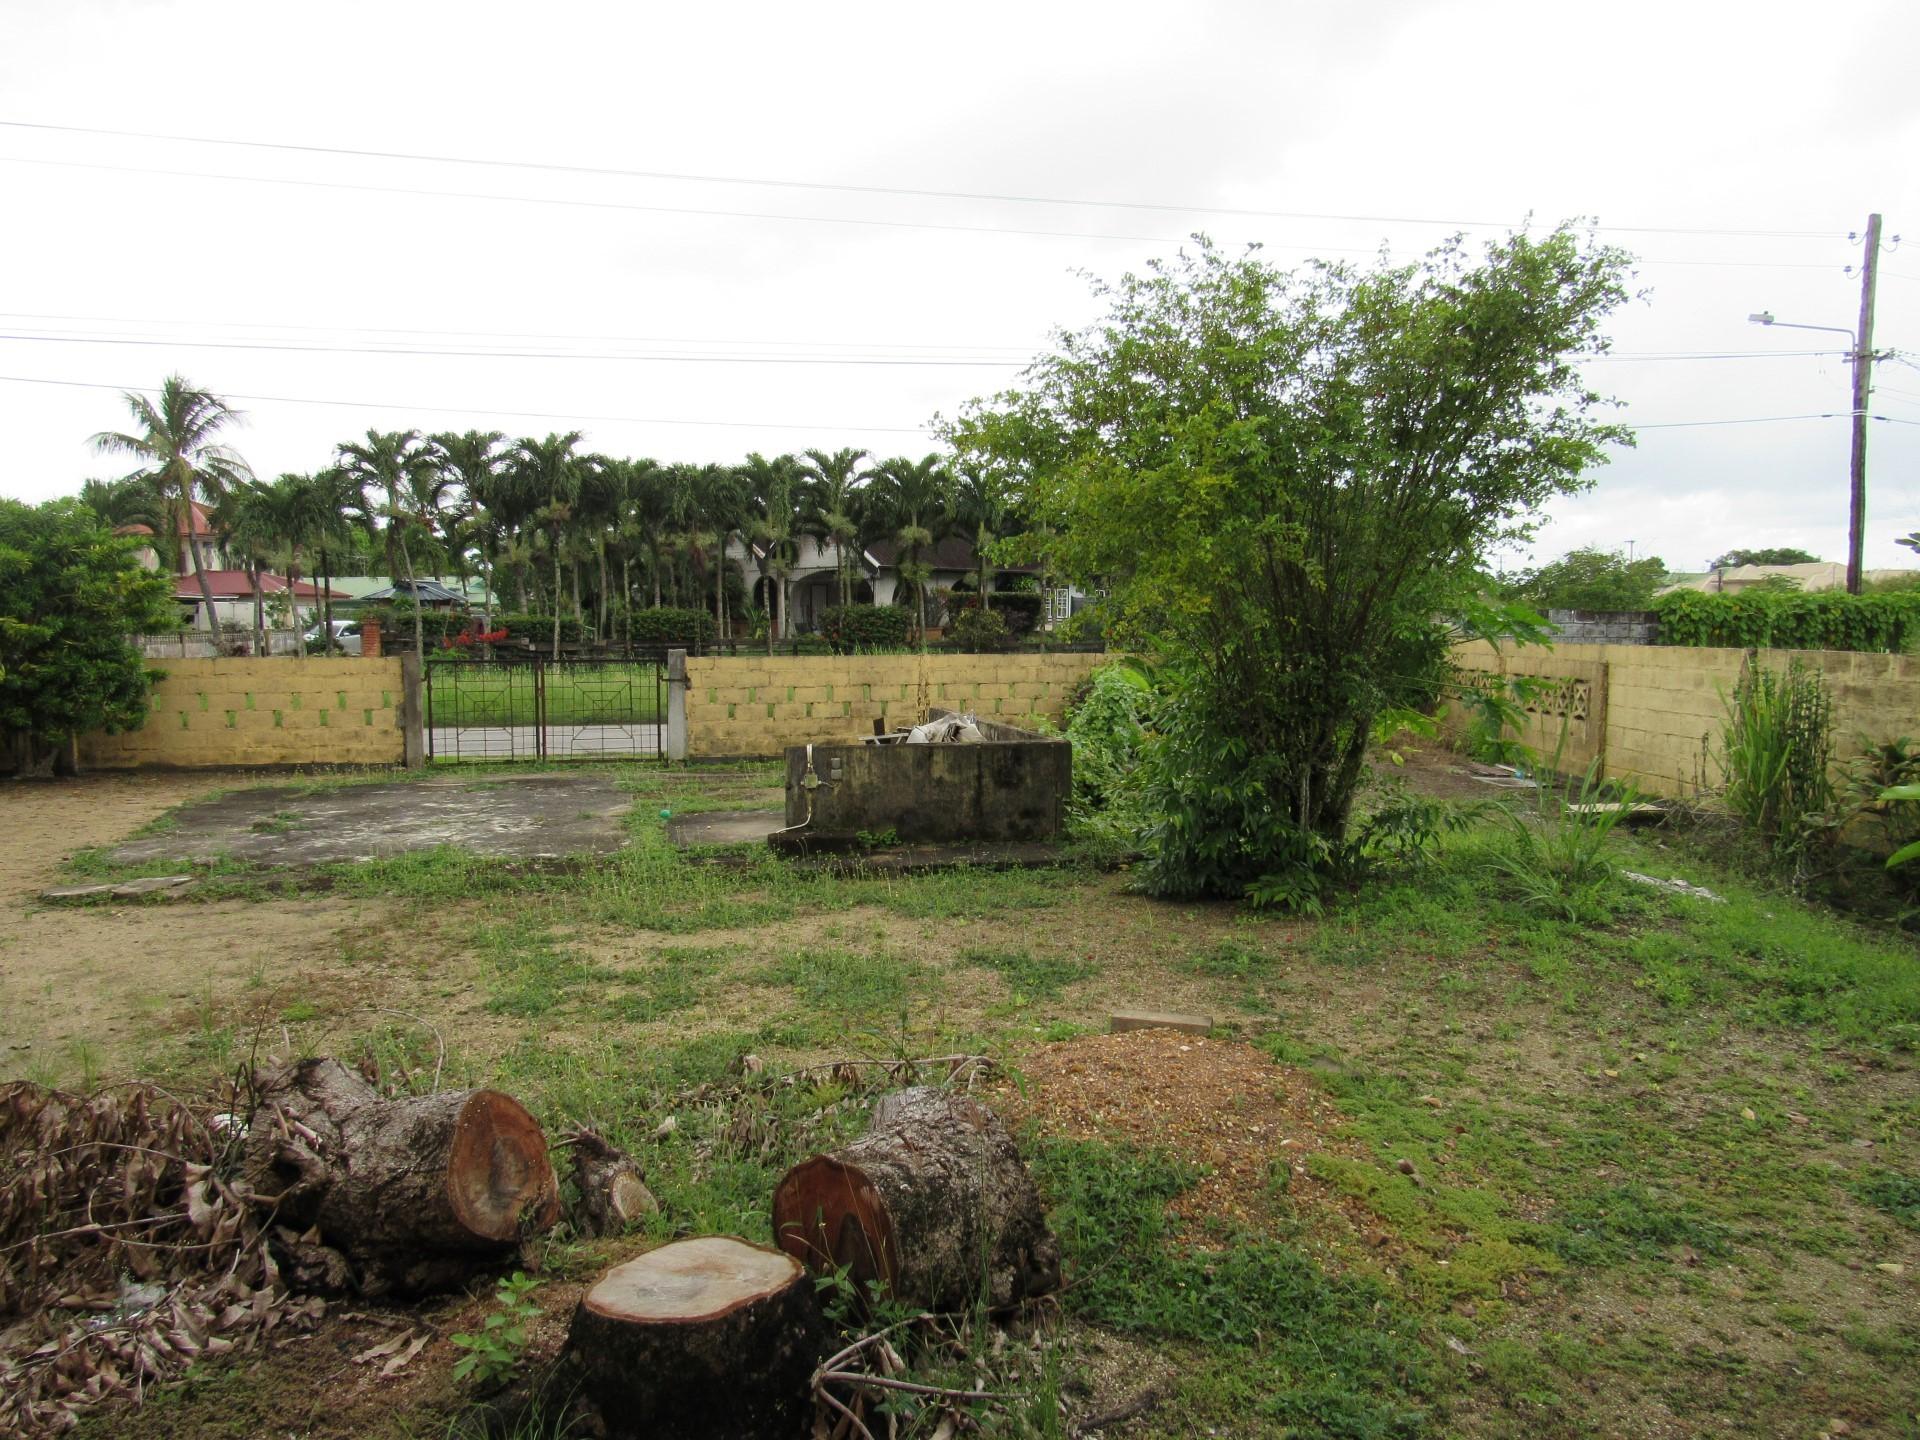 Henkielaan-32-Koopwoning-Terzol-Vastgoed-Paramaribo-Suriname-30